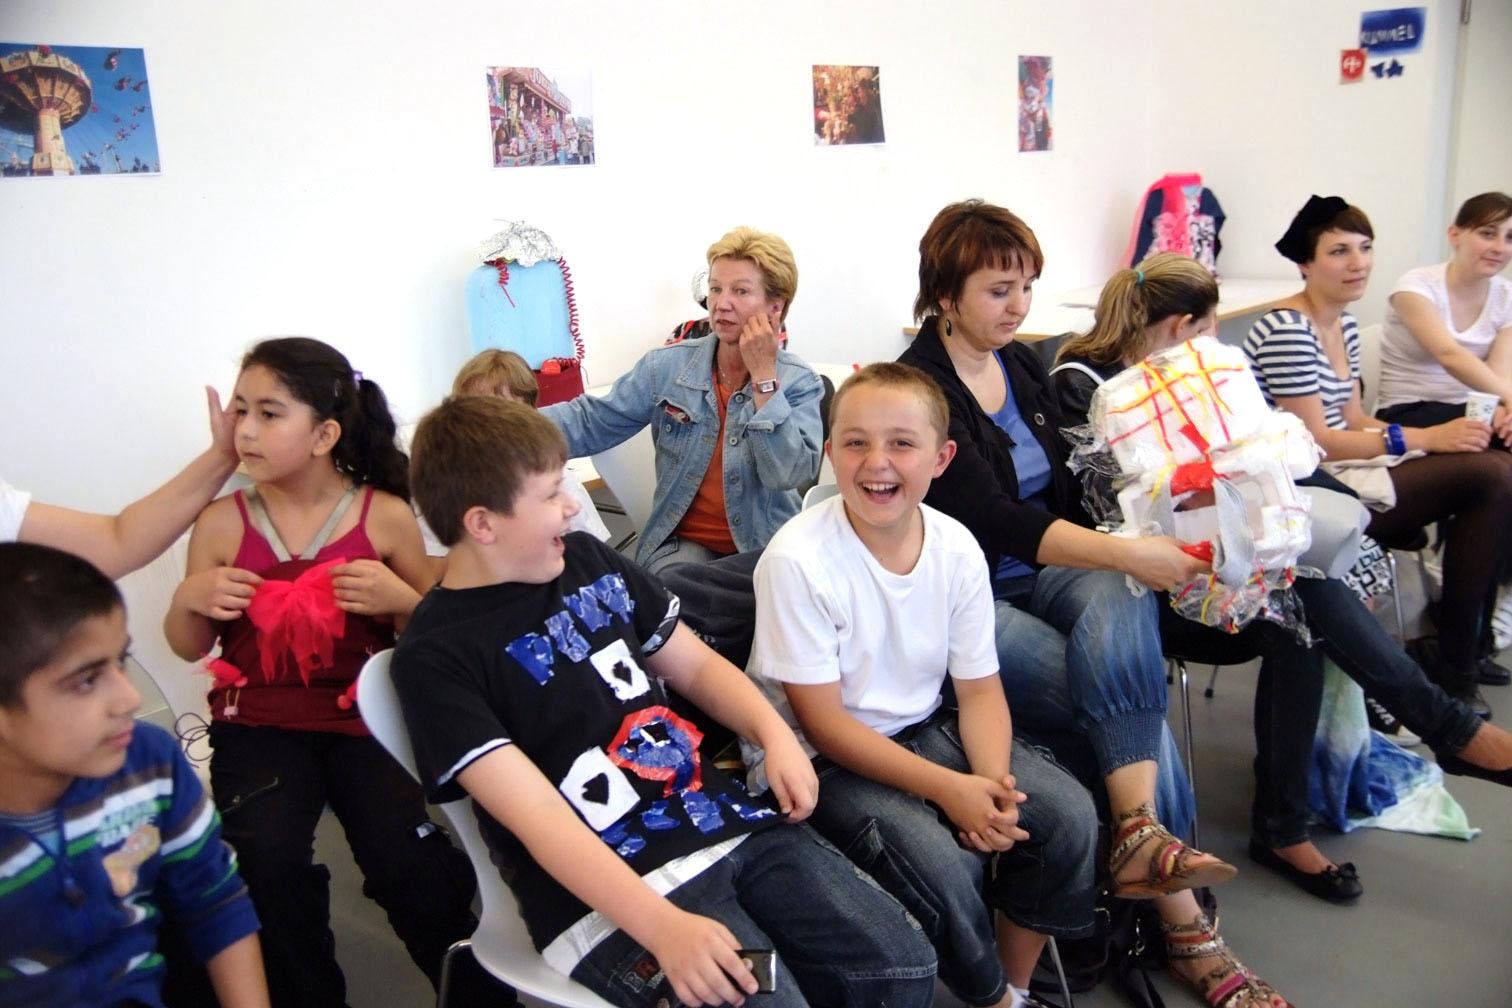 gerrit_schweiger-Rummel-2030-Zukunft-Kinder-Kreativität-Mode-Workshop-Modenschau-Ausstellung-_show09